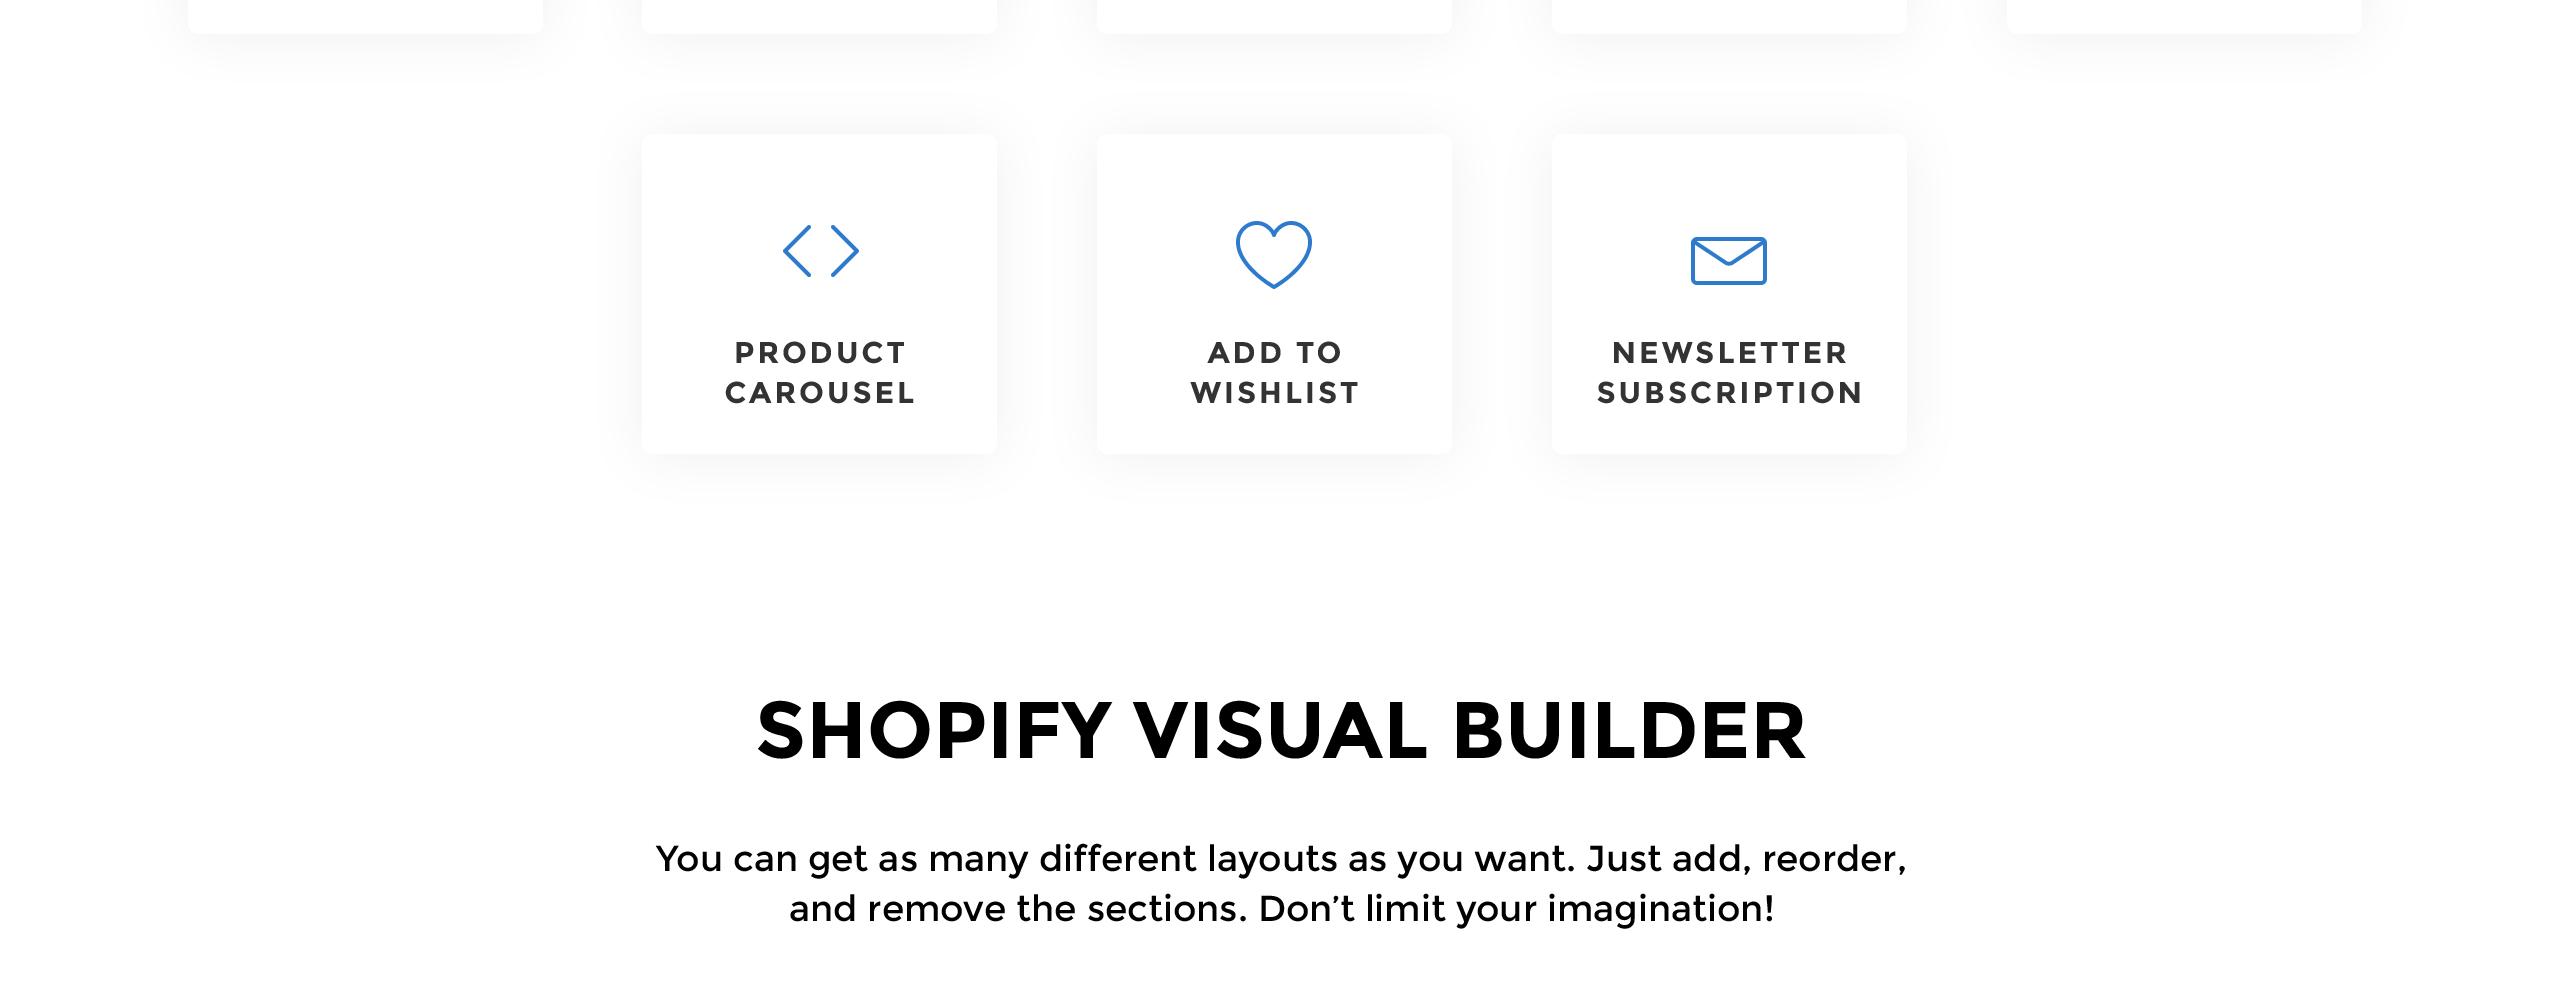 Website Design Template 74453 - electronics gadgets shop shopify